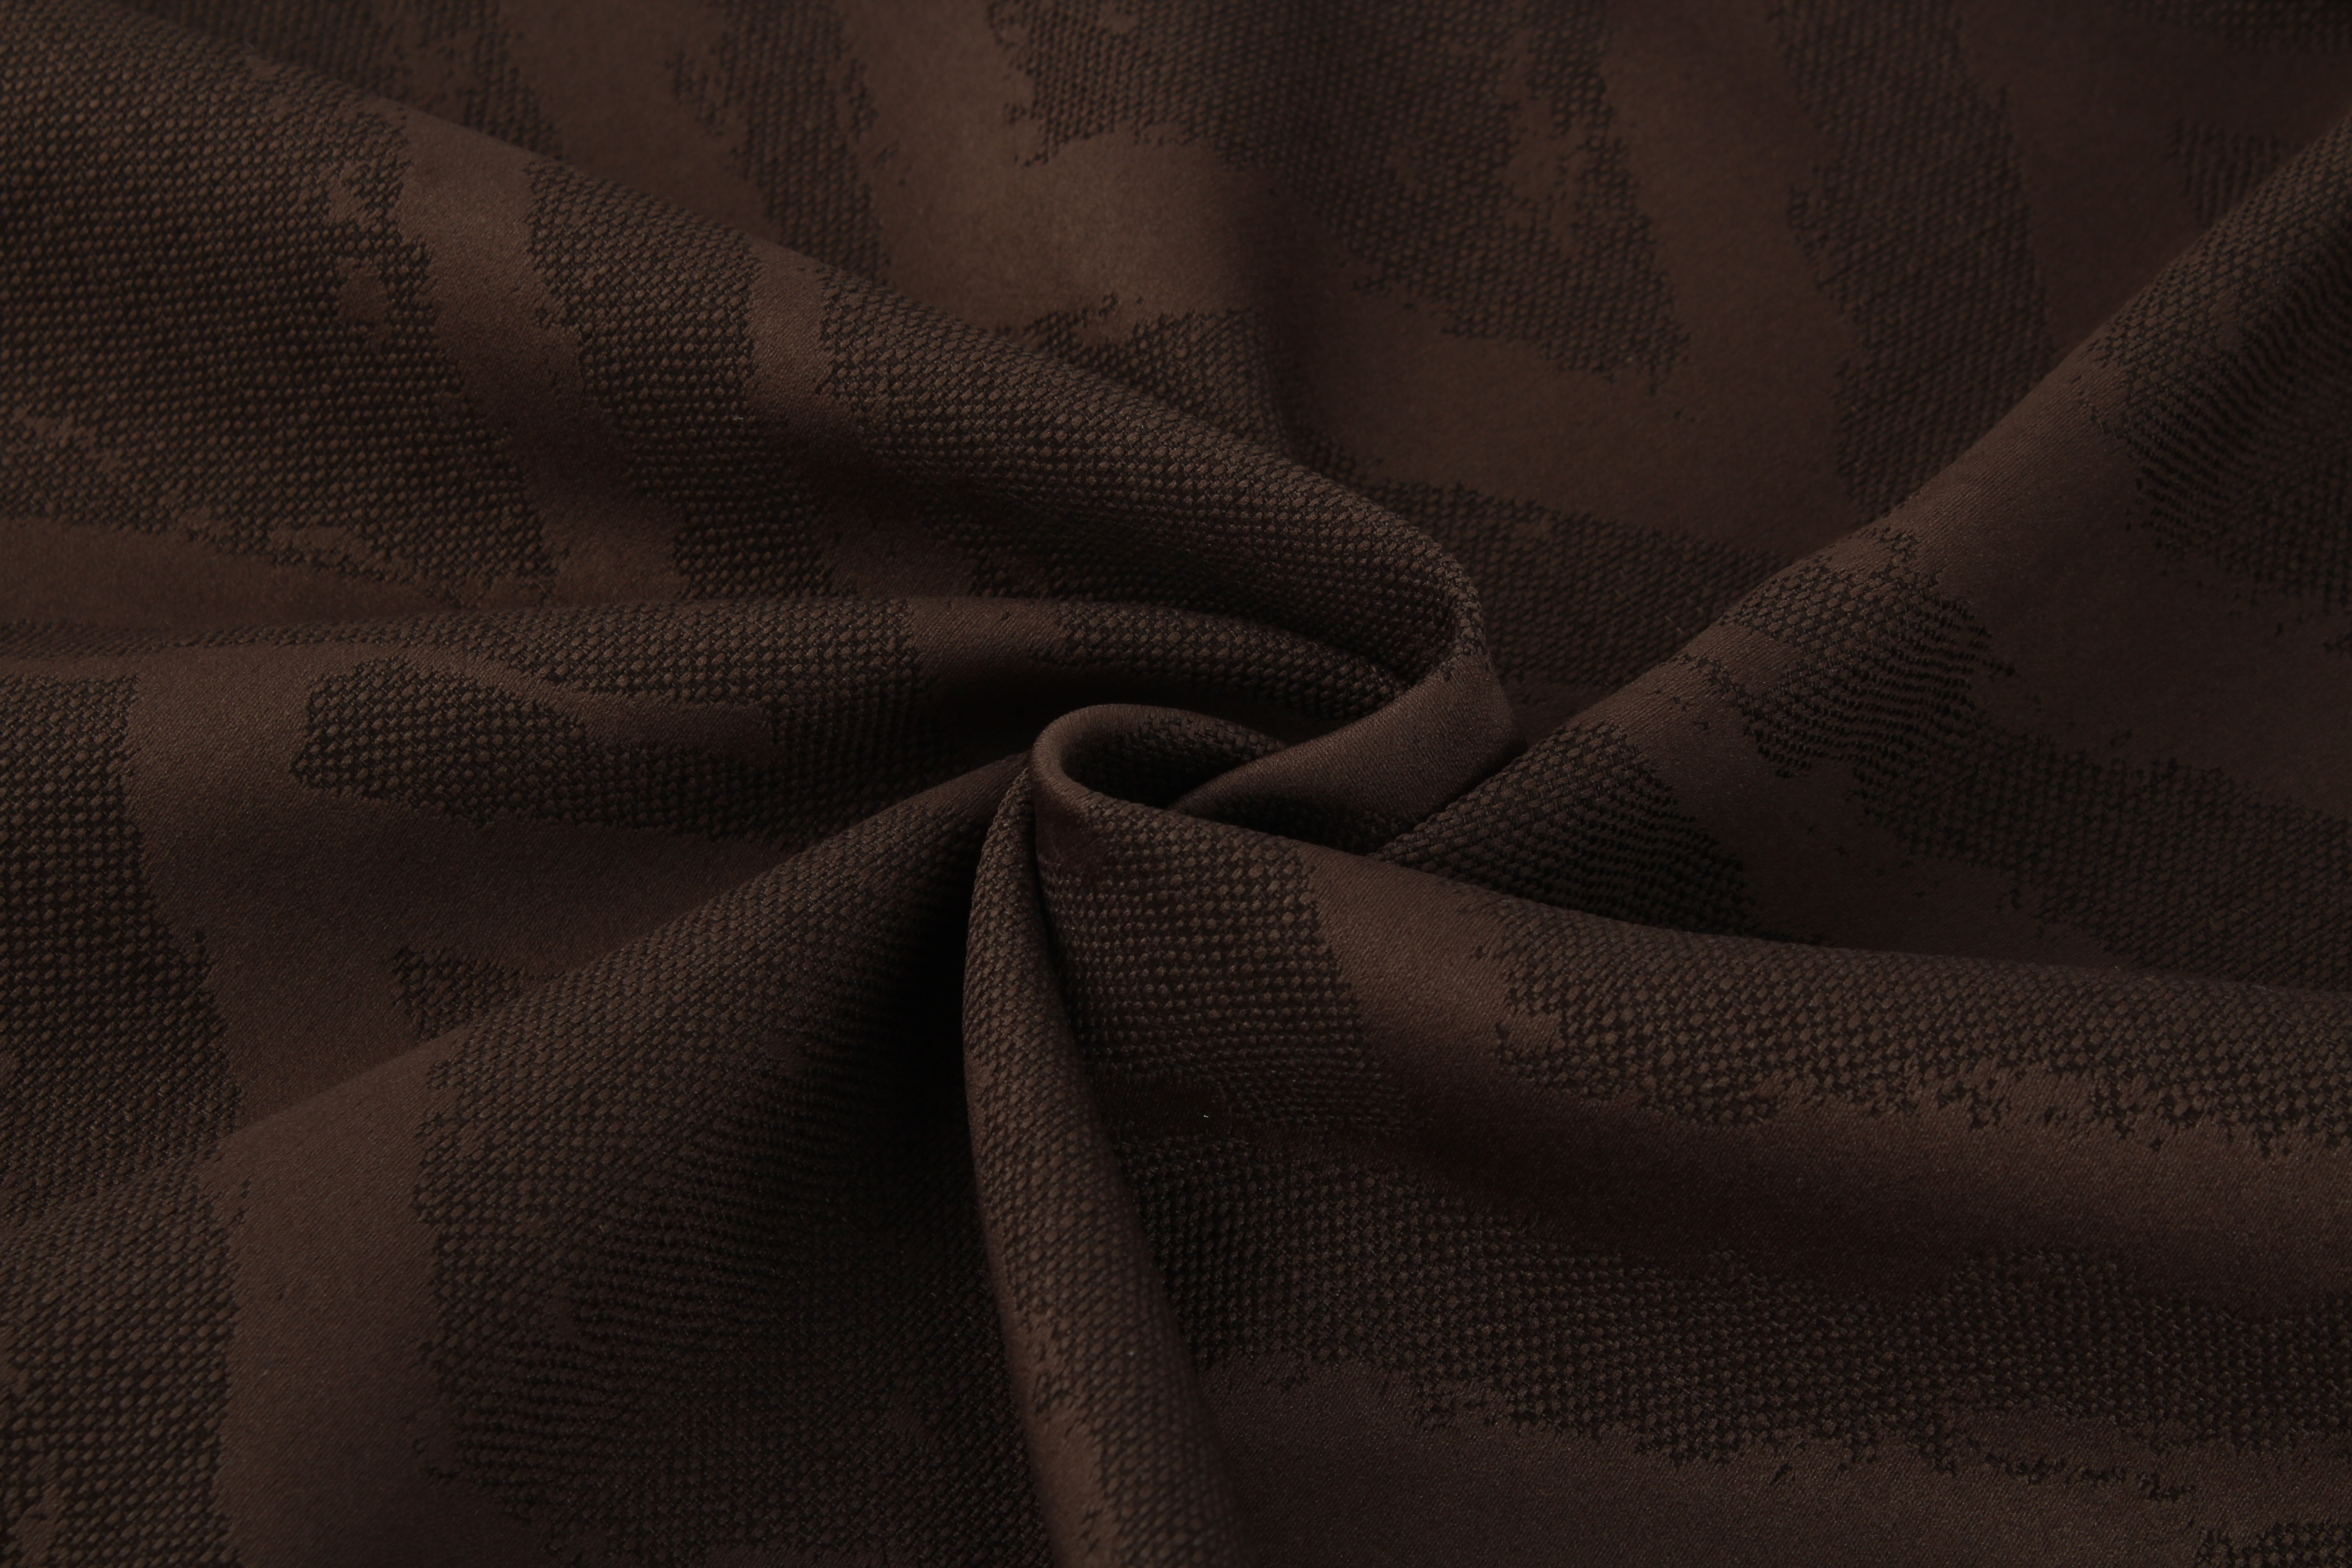 {} TexRepublic Материал Жаккард Rhombuses Цвет: Шоколадный